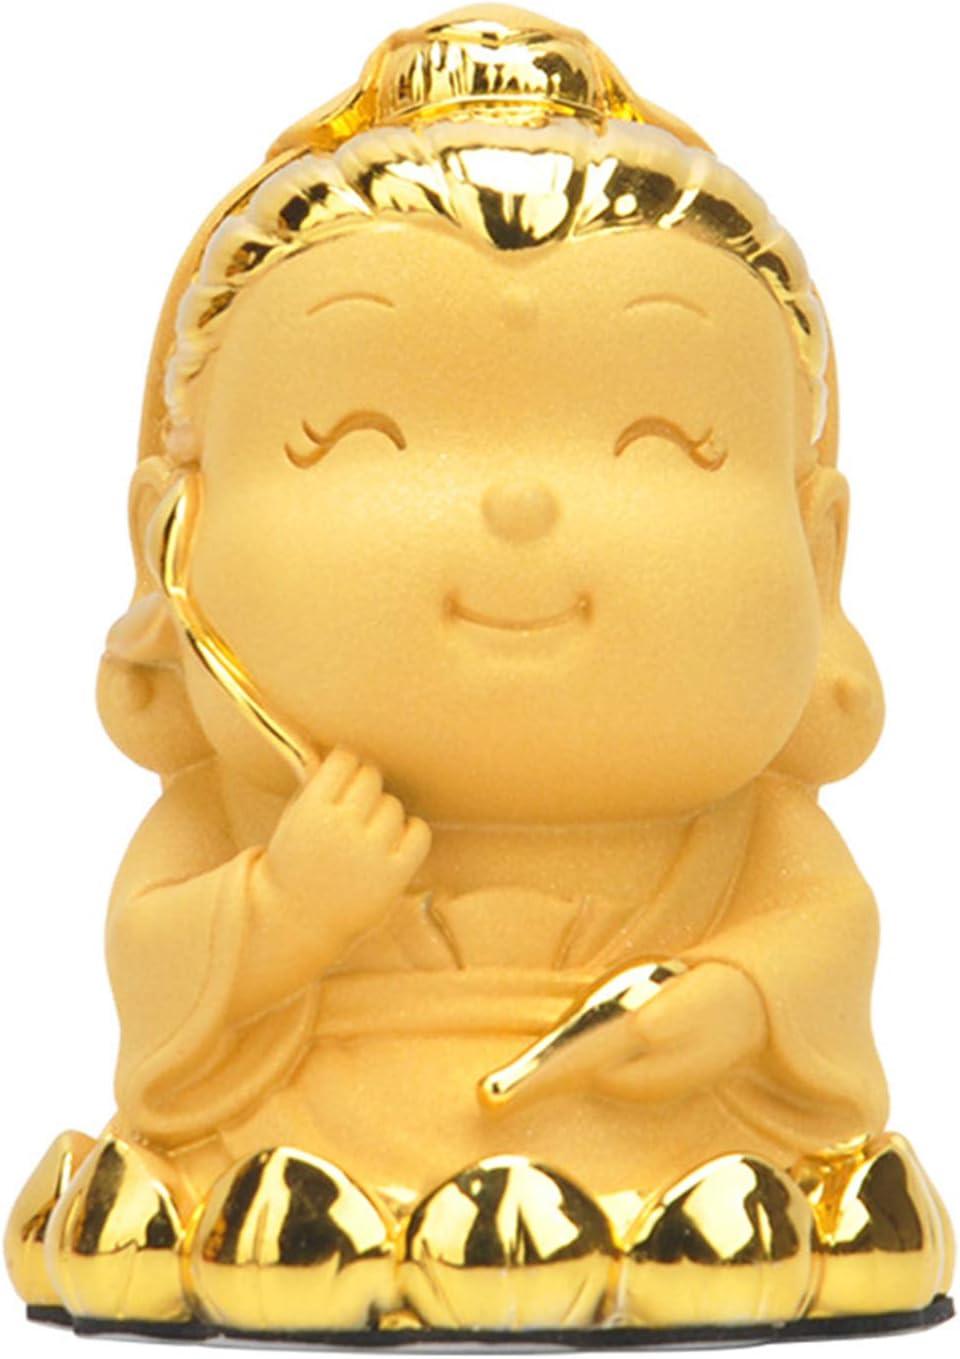 Guan Yin Statue, Kuan Yin Goddess of Mercy and Compassion Quan Yin Home Decor Bodhisattva Avalokitesvara Figurine